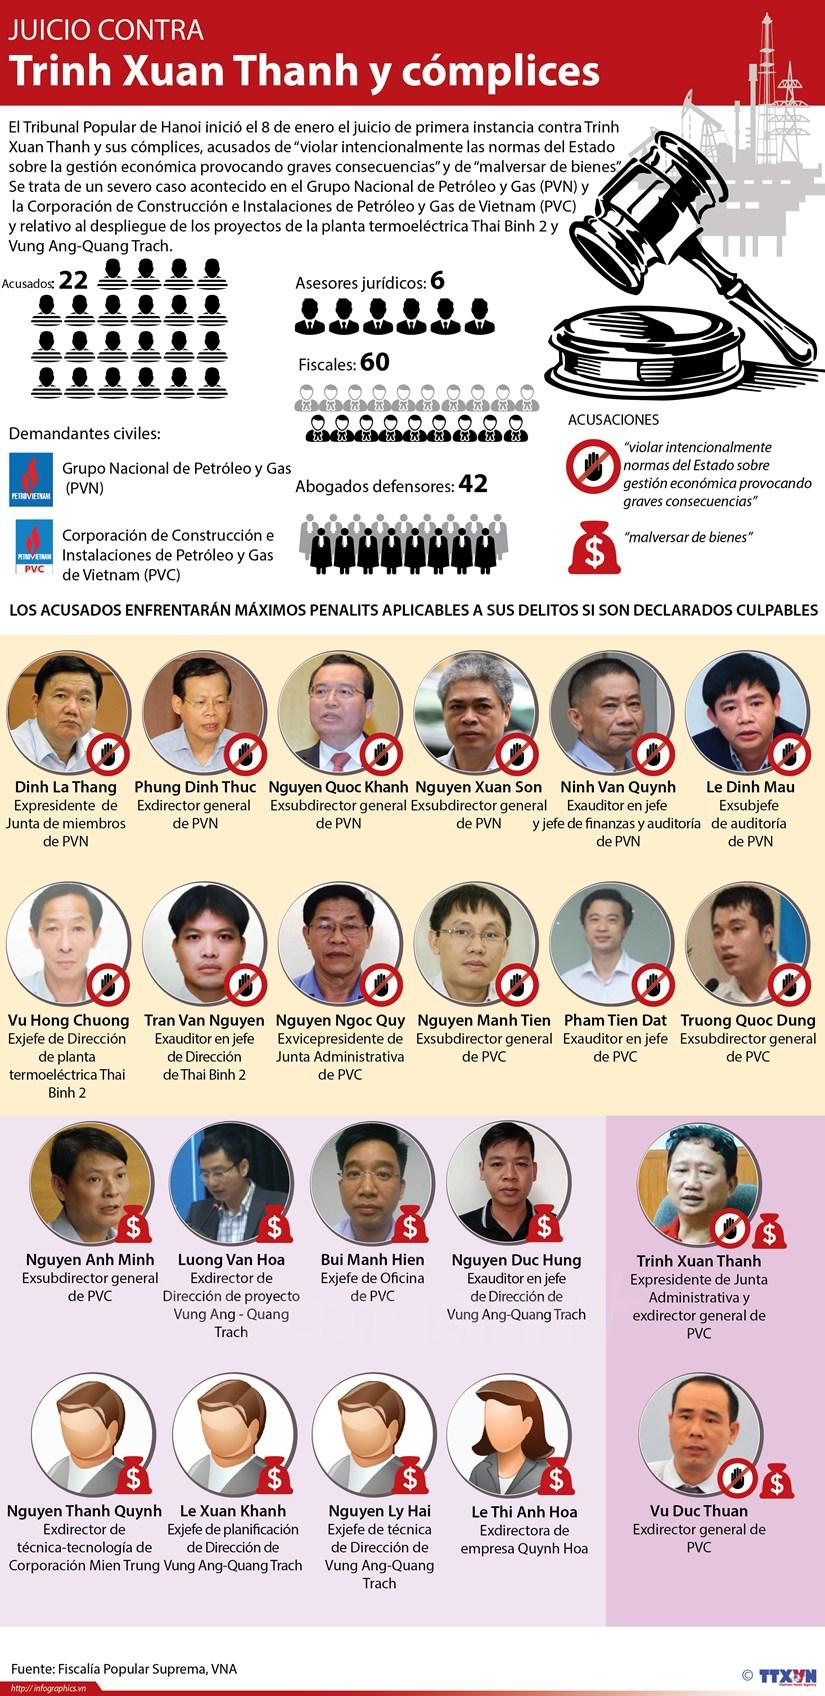 [Infografia] Juicio contra Trinh Xuan Thanh y complices hinh anh 1